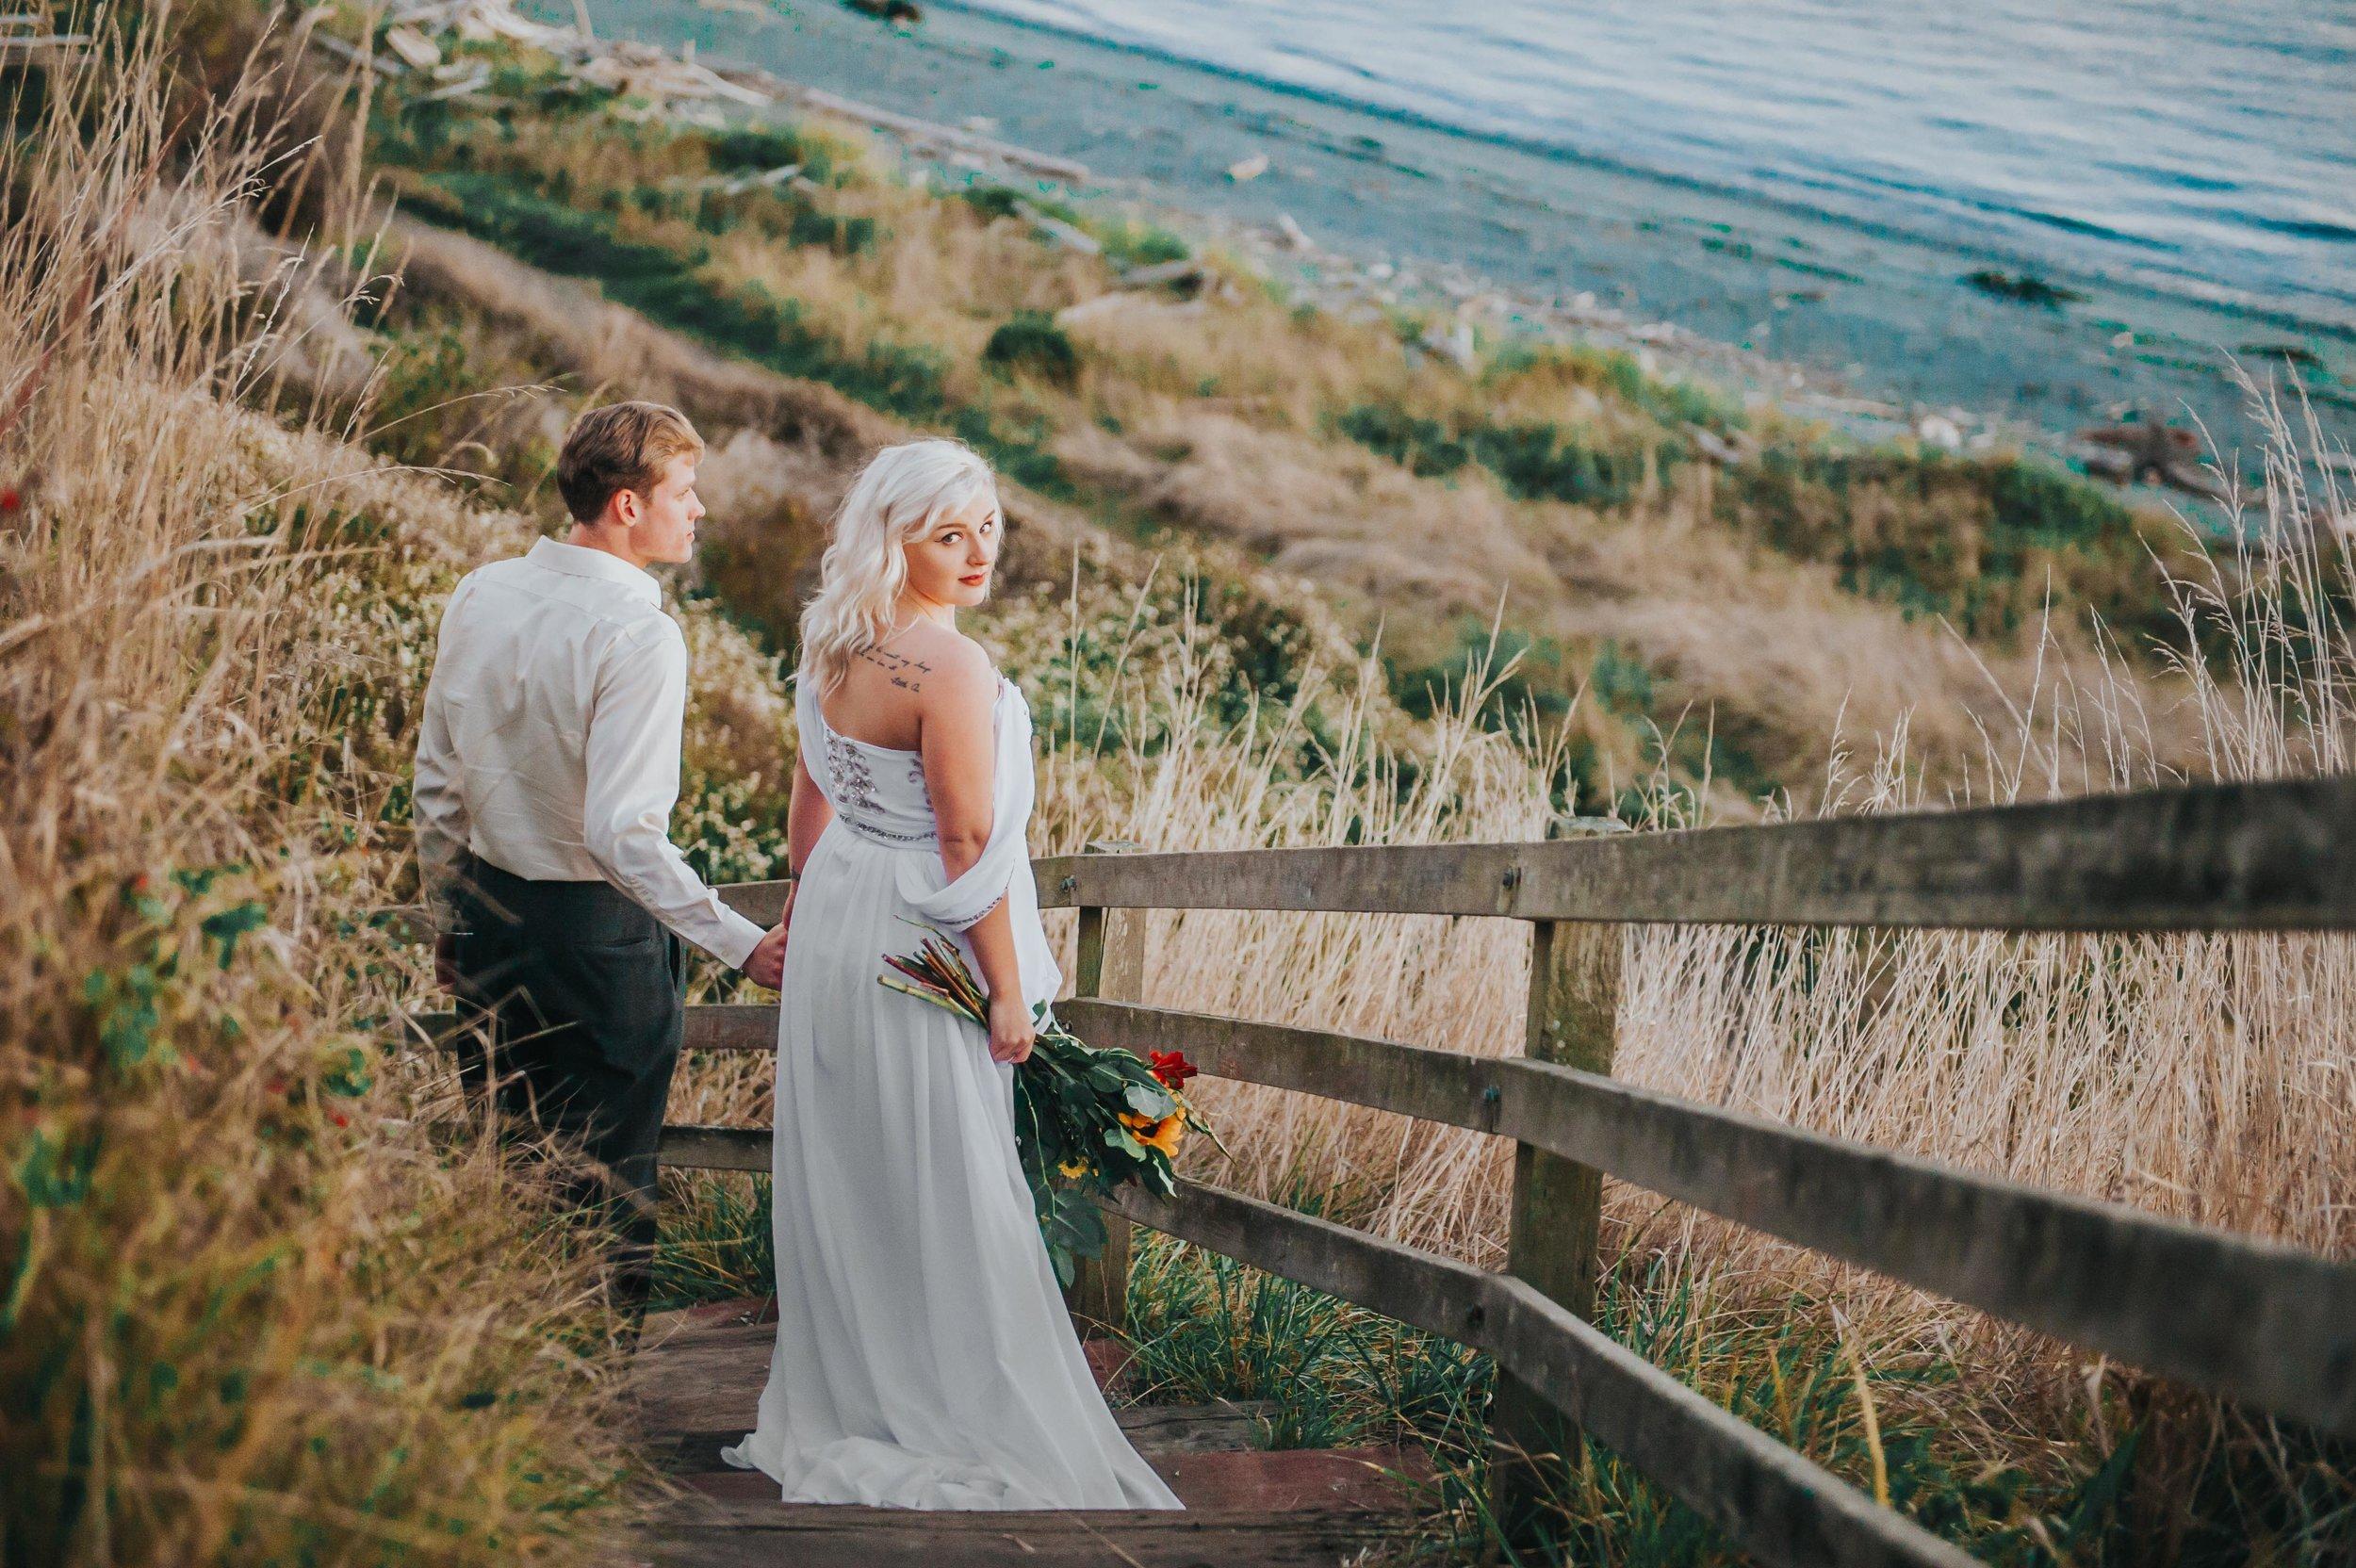 Whidbey-Island-Wedding-Photographer-J-Hodges (1 of 1).jpg